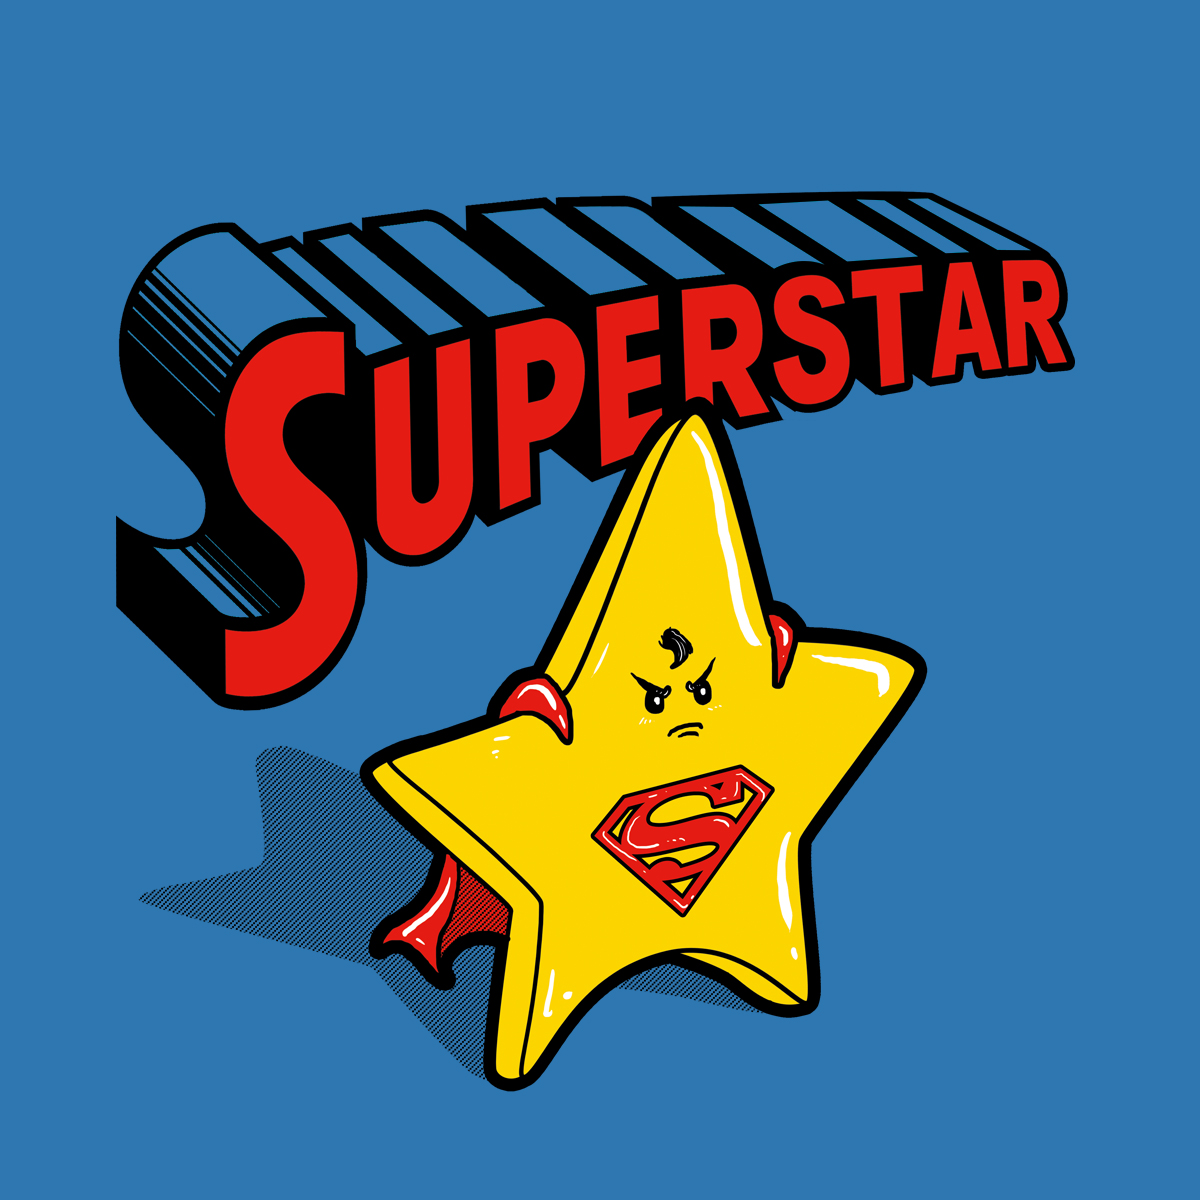 SUPERSTAR_saphire_shirt_design